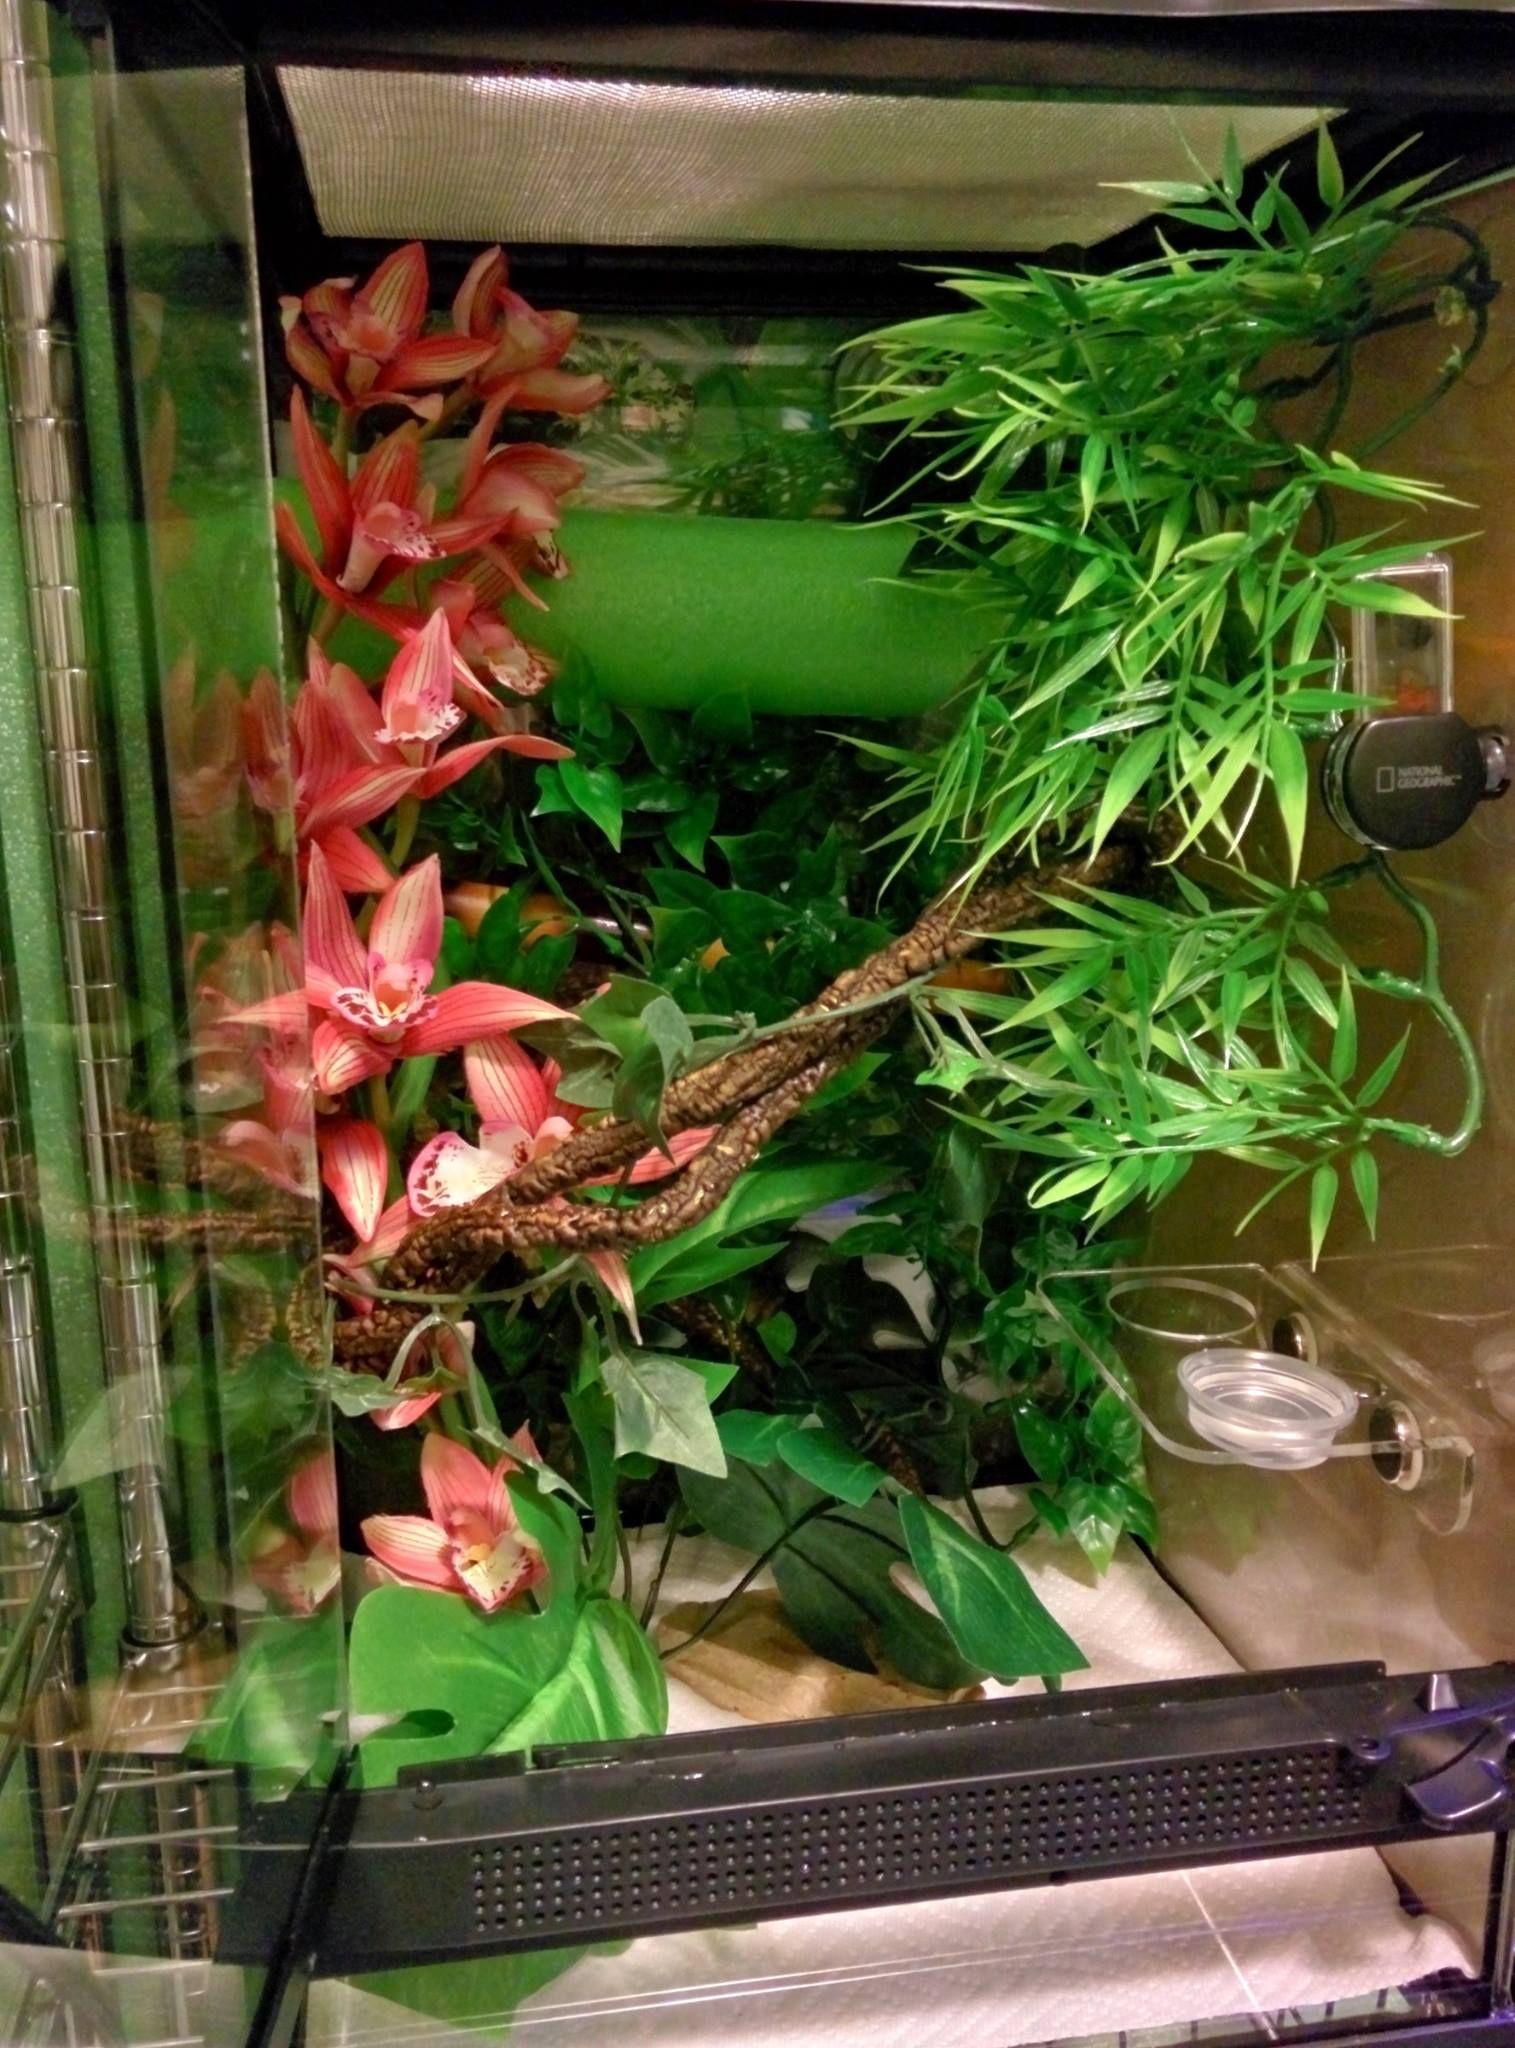 12x18 Zoo Med Tank Setup For Crested Gecko Pool Noodles